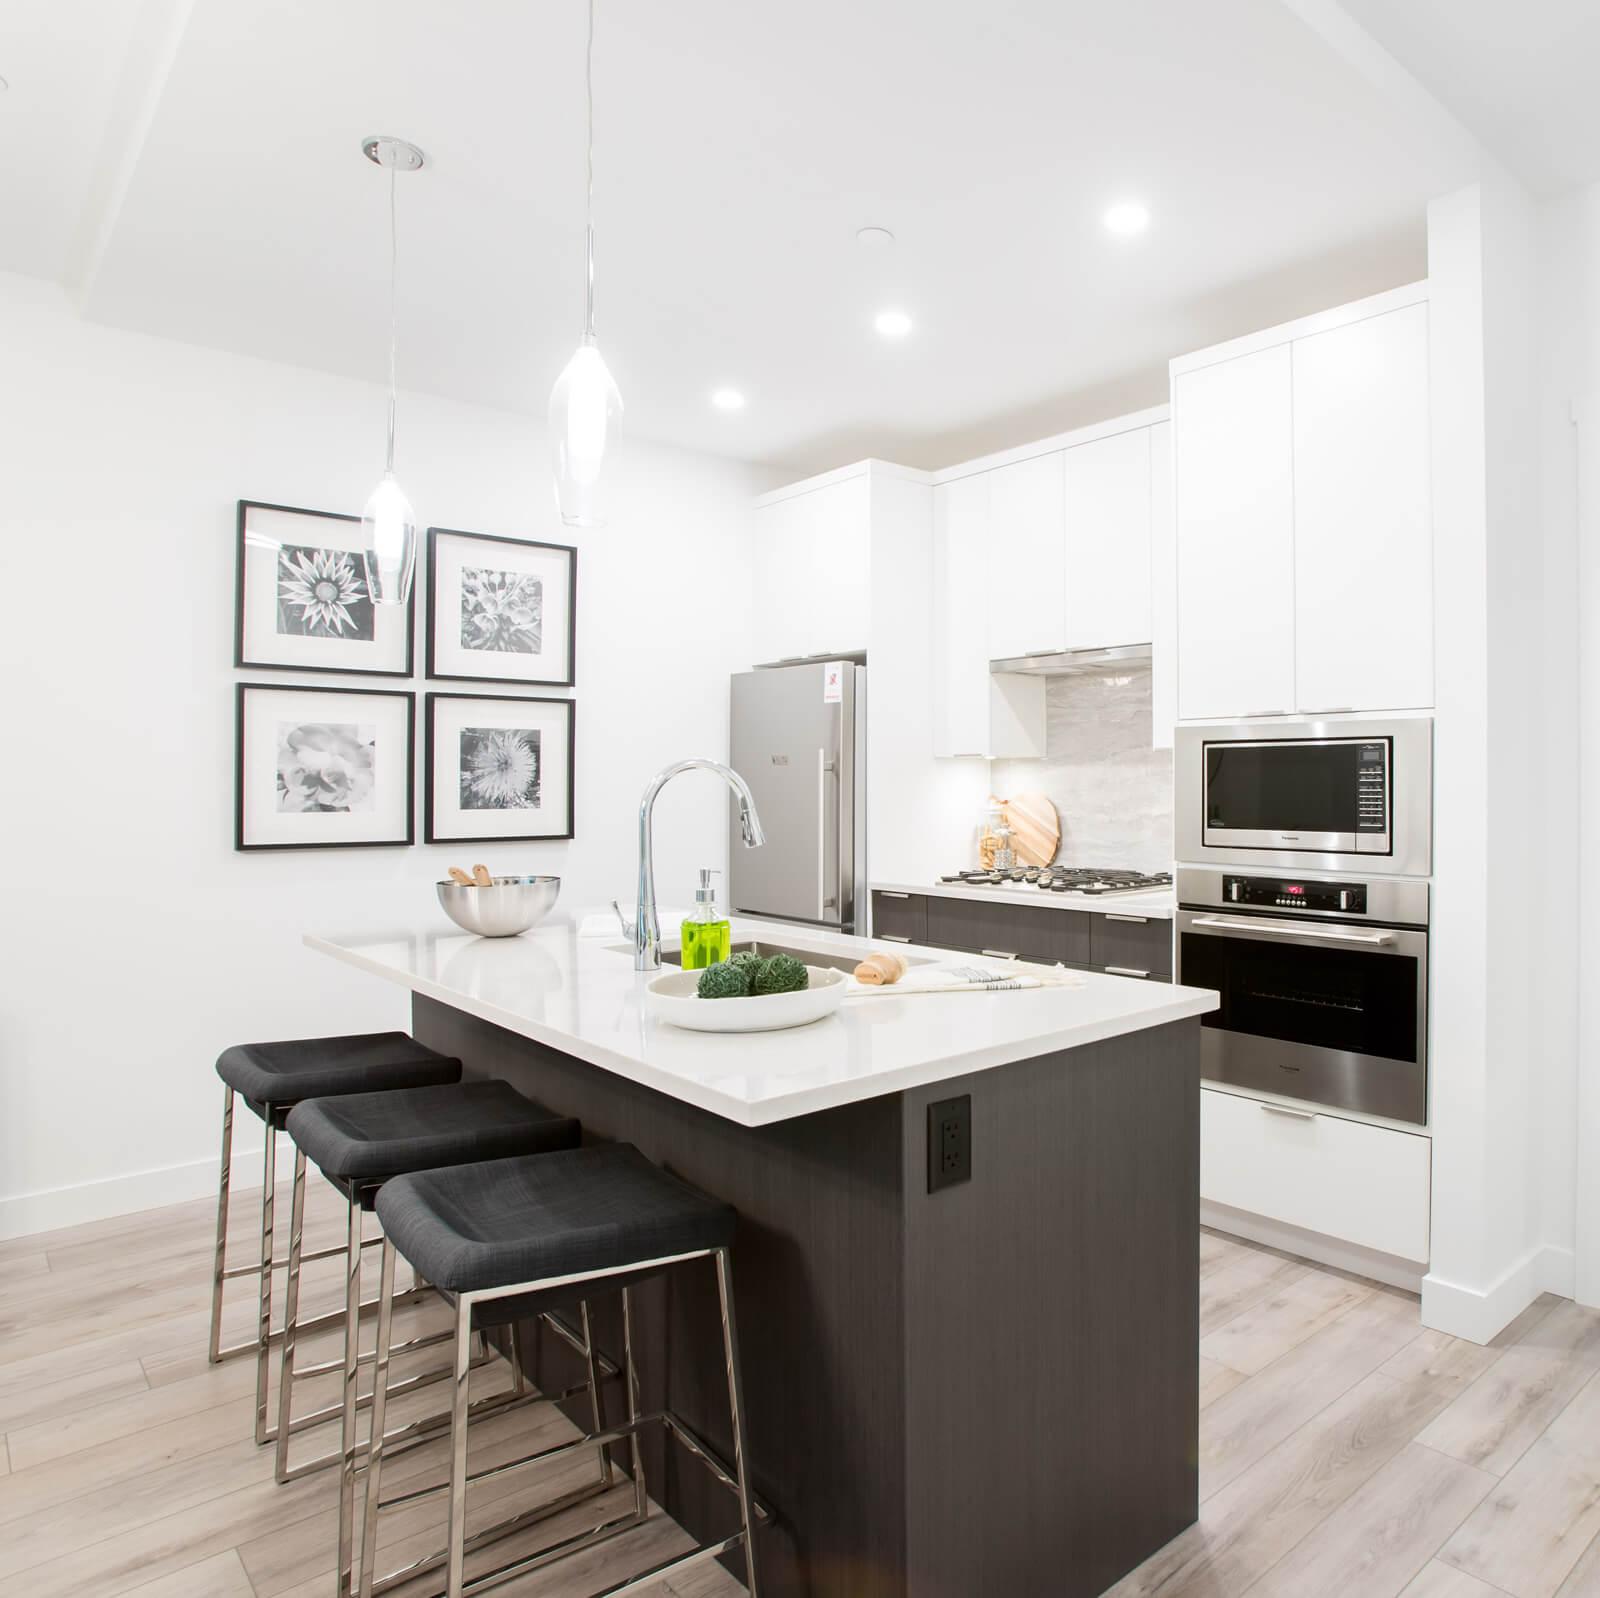 https://mk0highpointeaf8ie02.kinstacdn.com/wp-content/uploads/2019/07/Model-kitchen.jpg